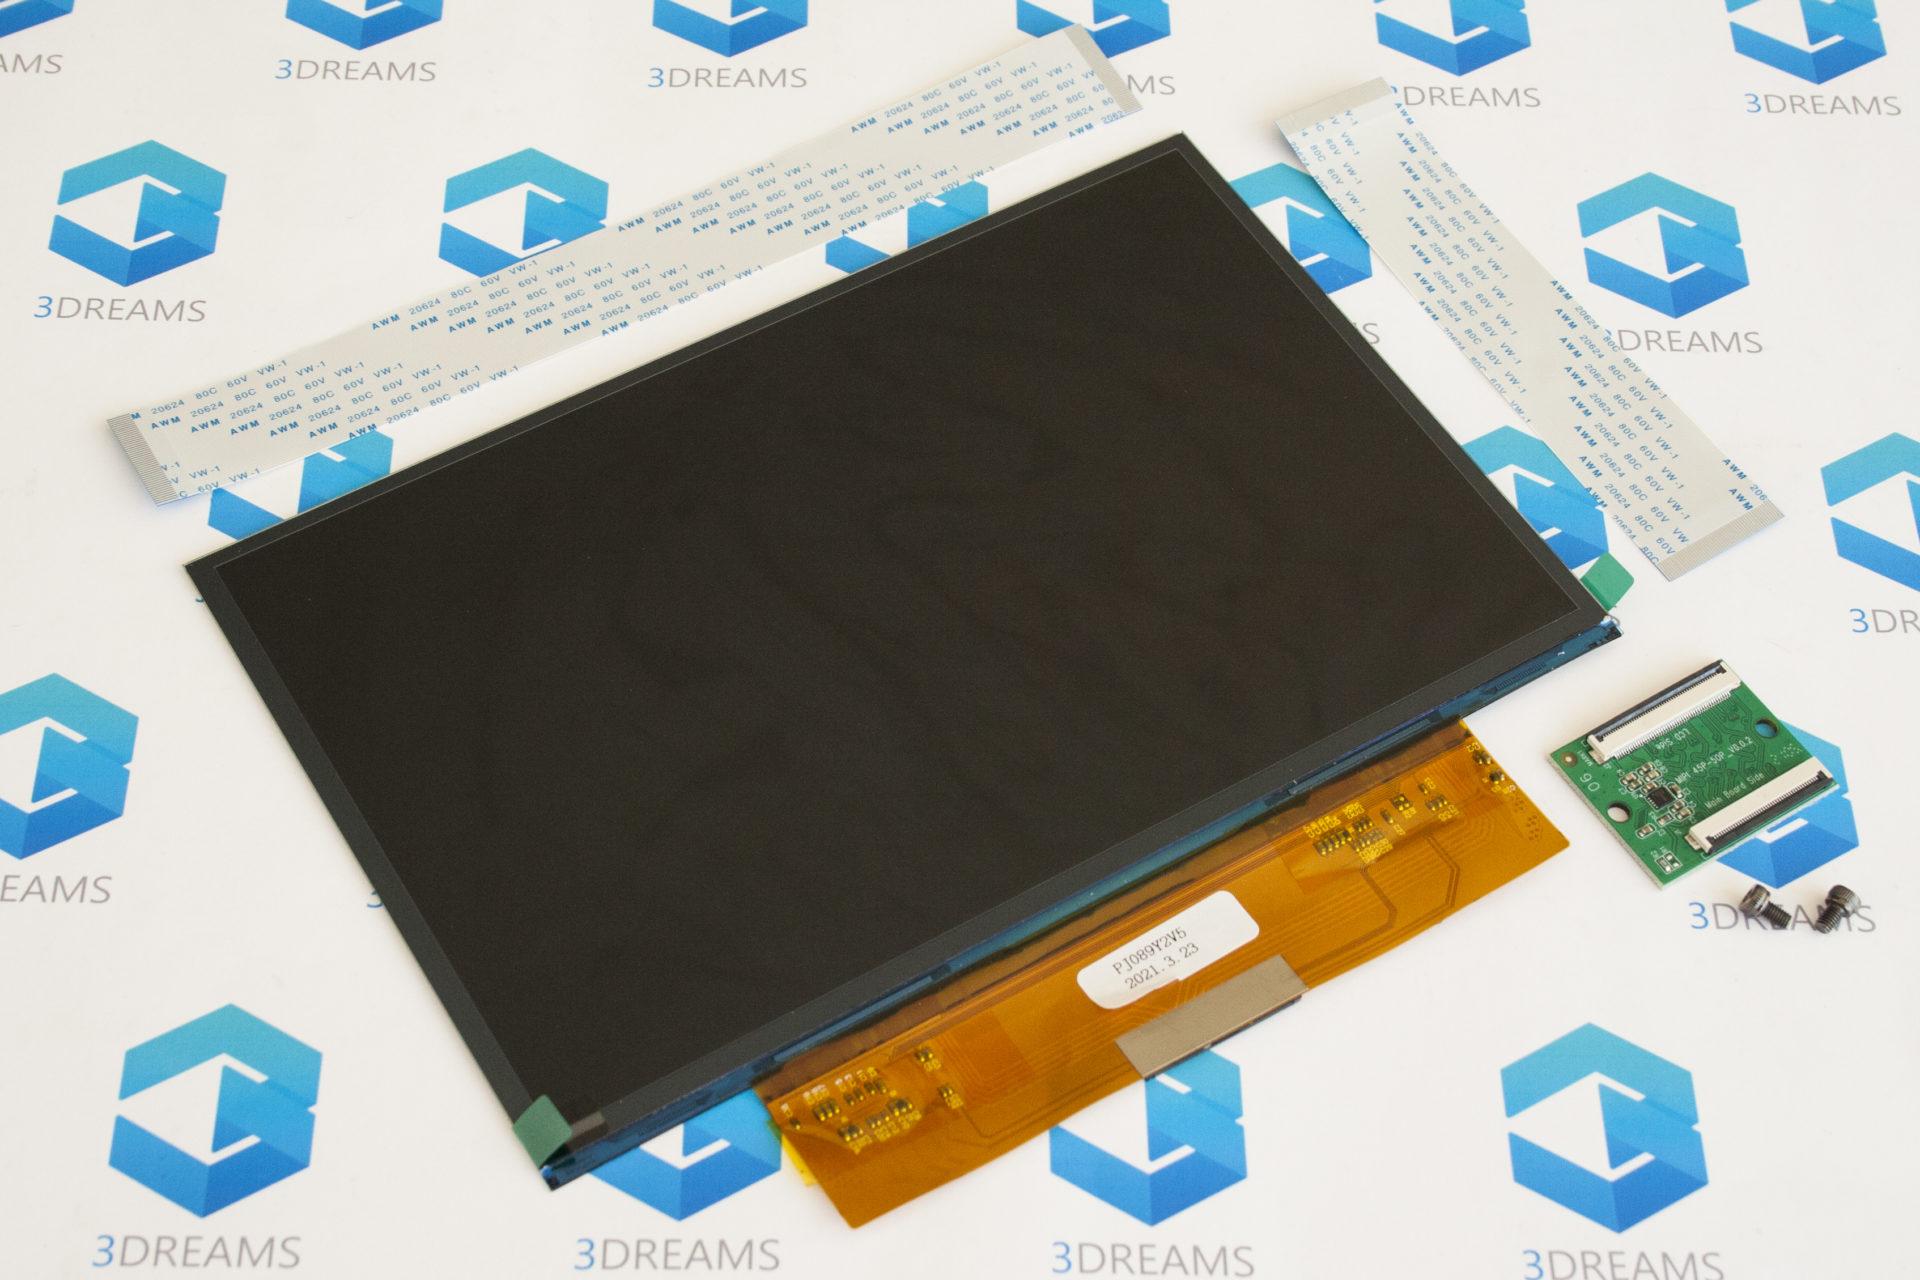 Дисплей (Матрица) LCD 4K для Anycubic Photon Mono X купить украина 1